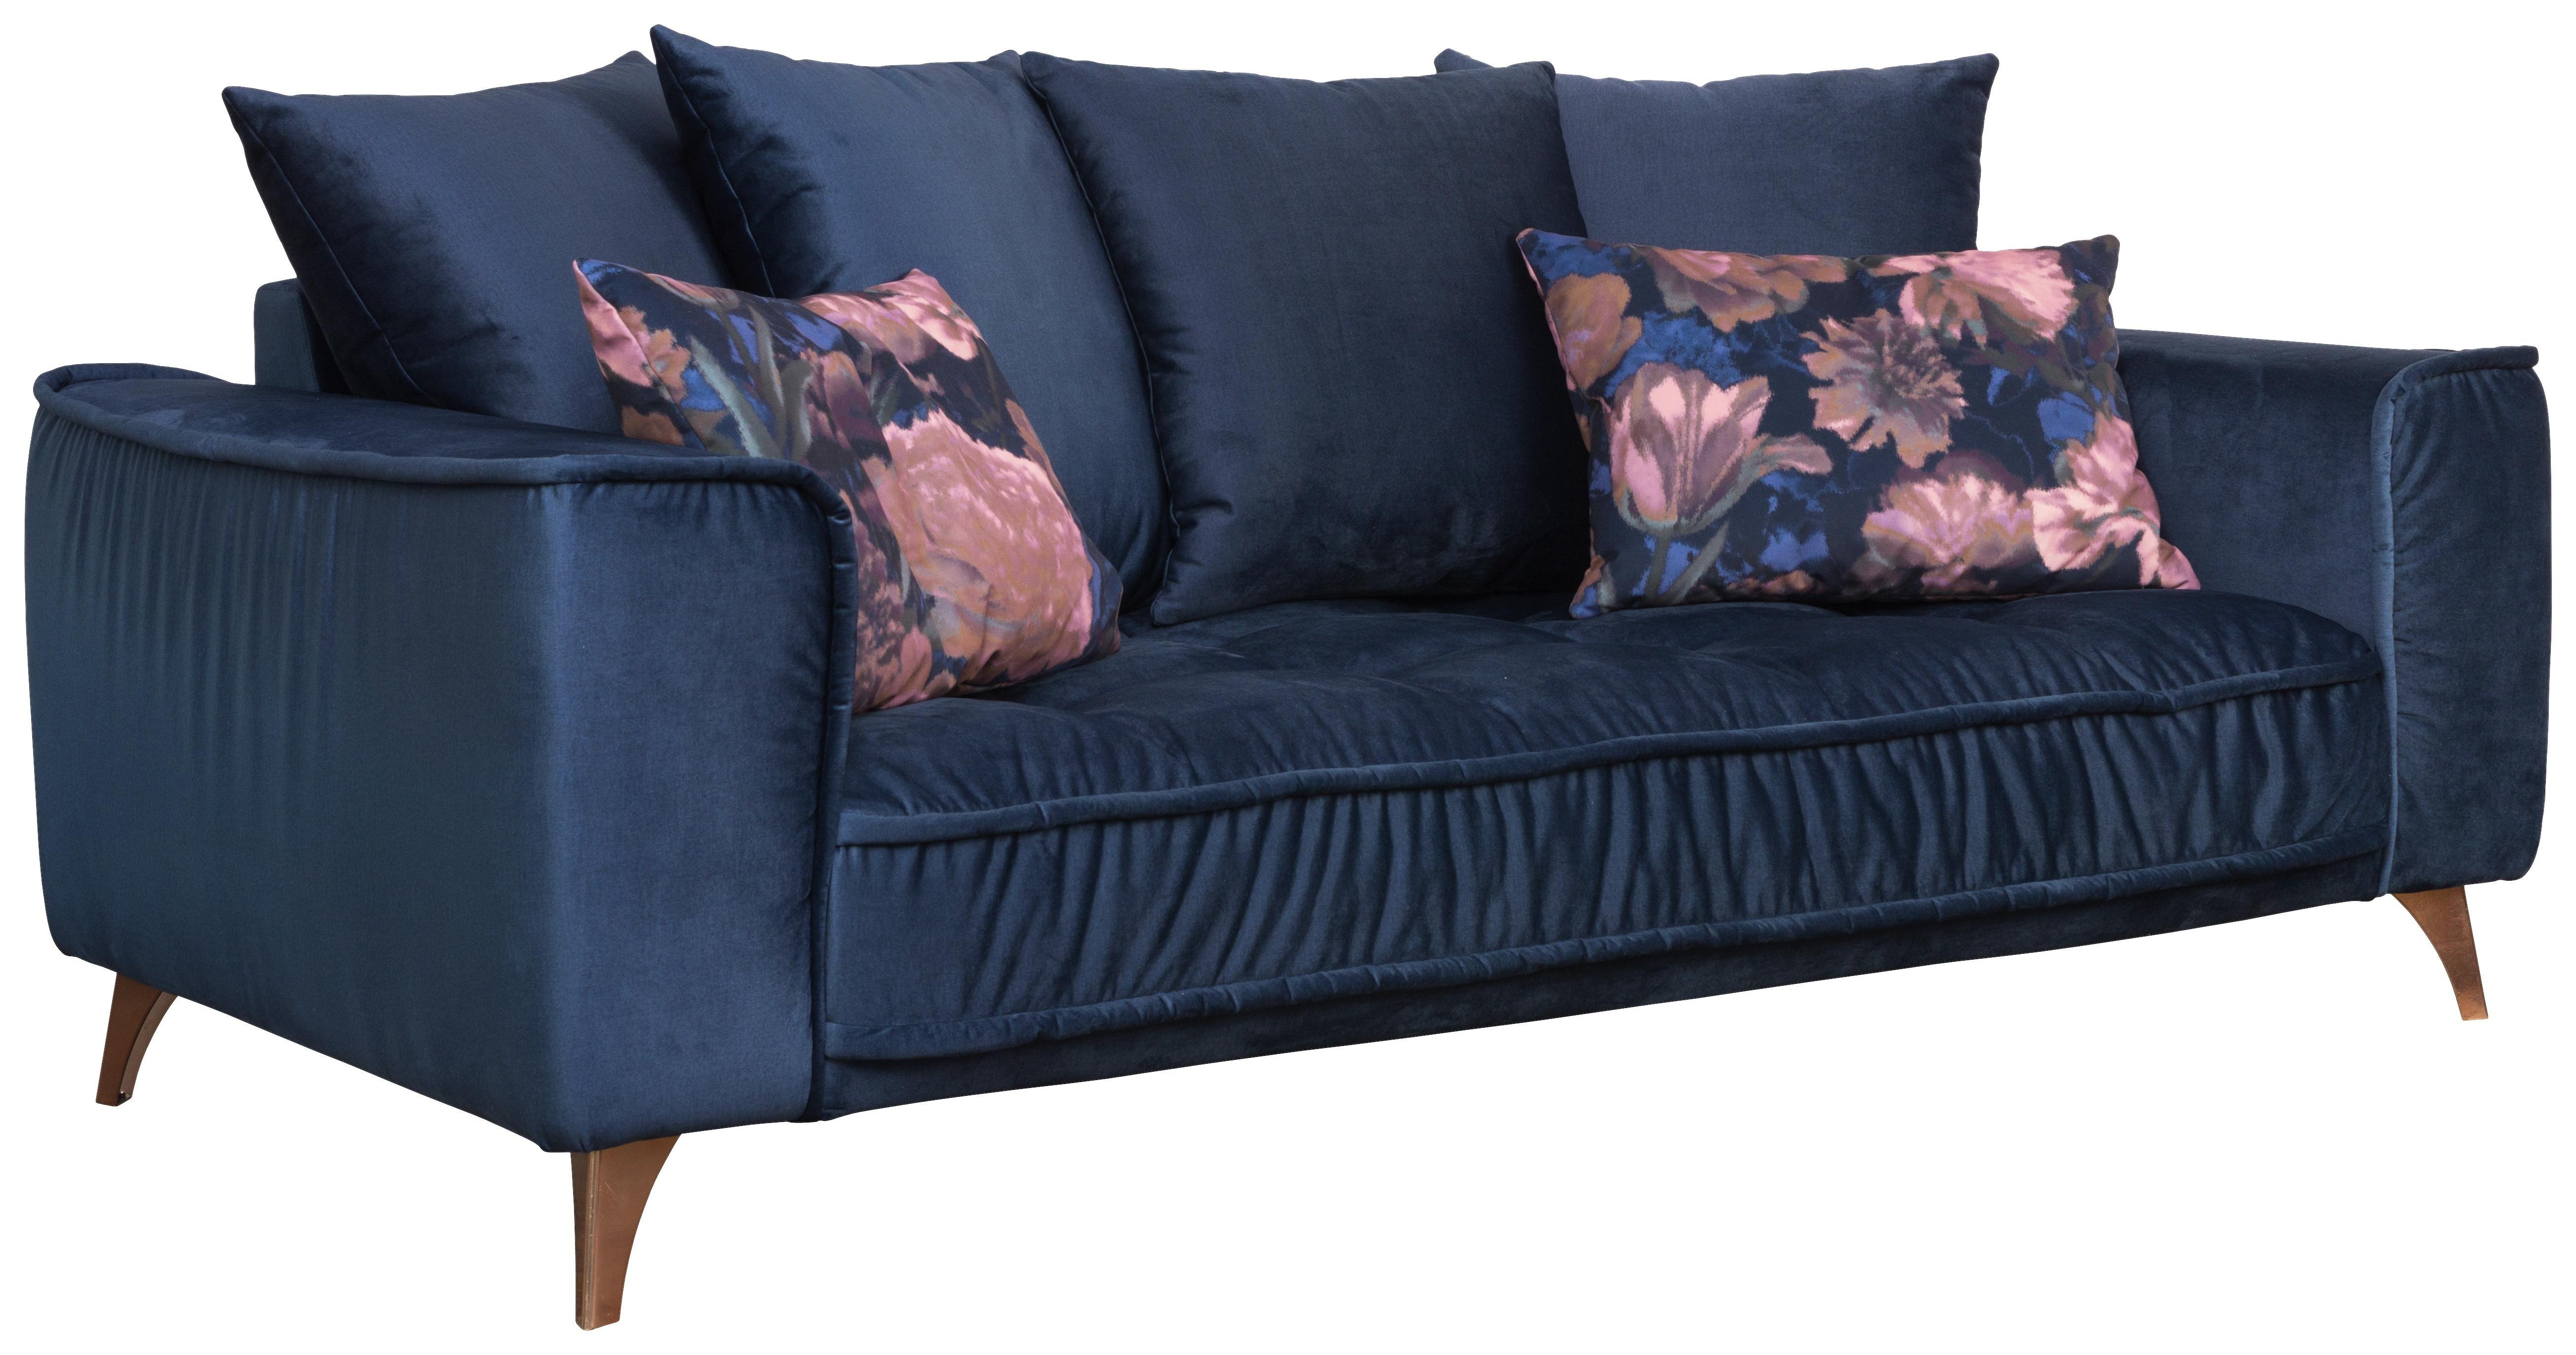 Sofa B: 204 cm - Dunkelblau/Kupferfarben, MODERN, Textil (204/92/106cm) - Luca Bessoni